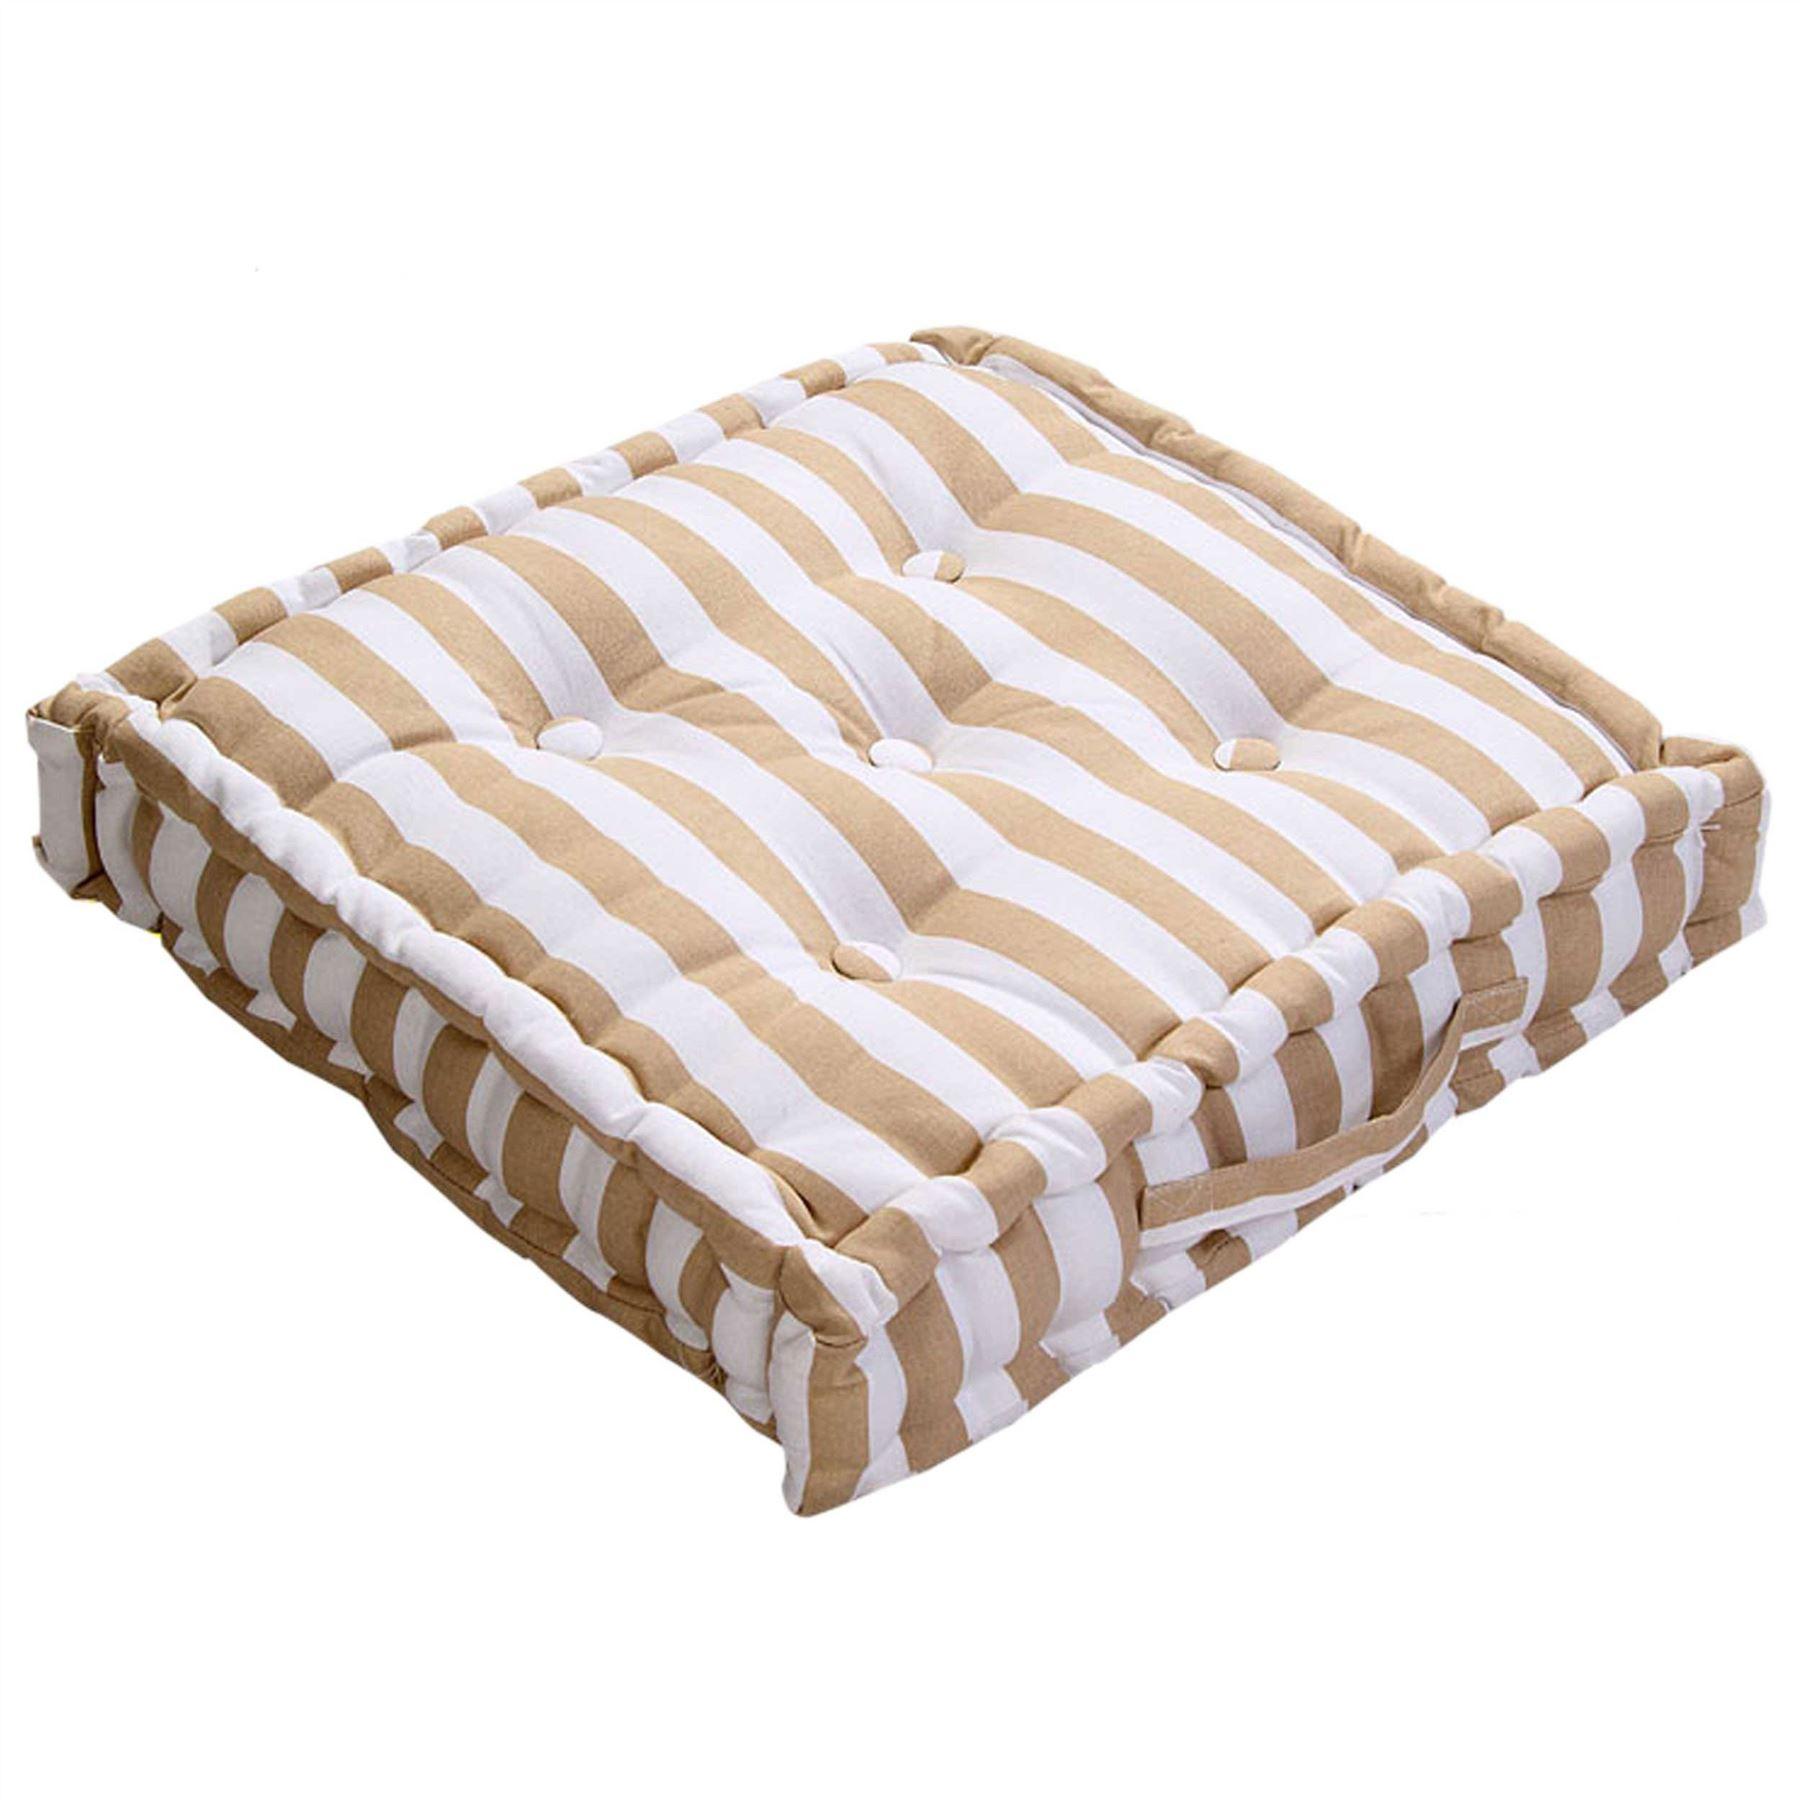 Floor Dining Pillows : Thick & Thin Stripe Floor Cushion Seat Pad Riser Dining Chair Booster Cushion eBay